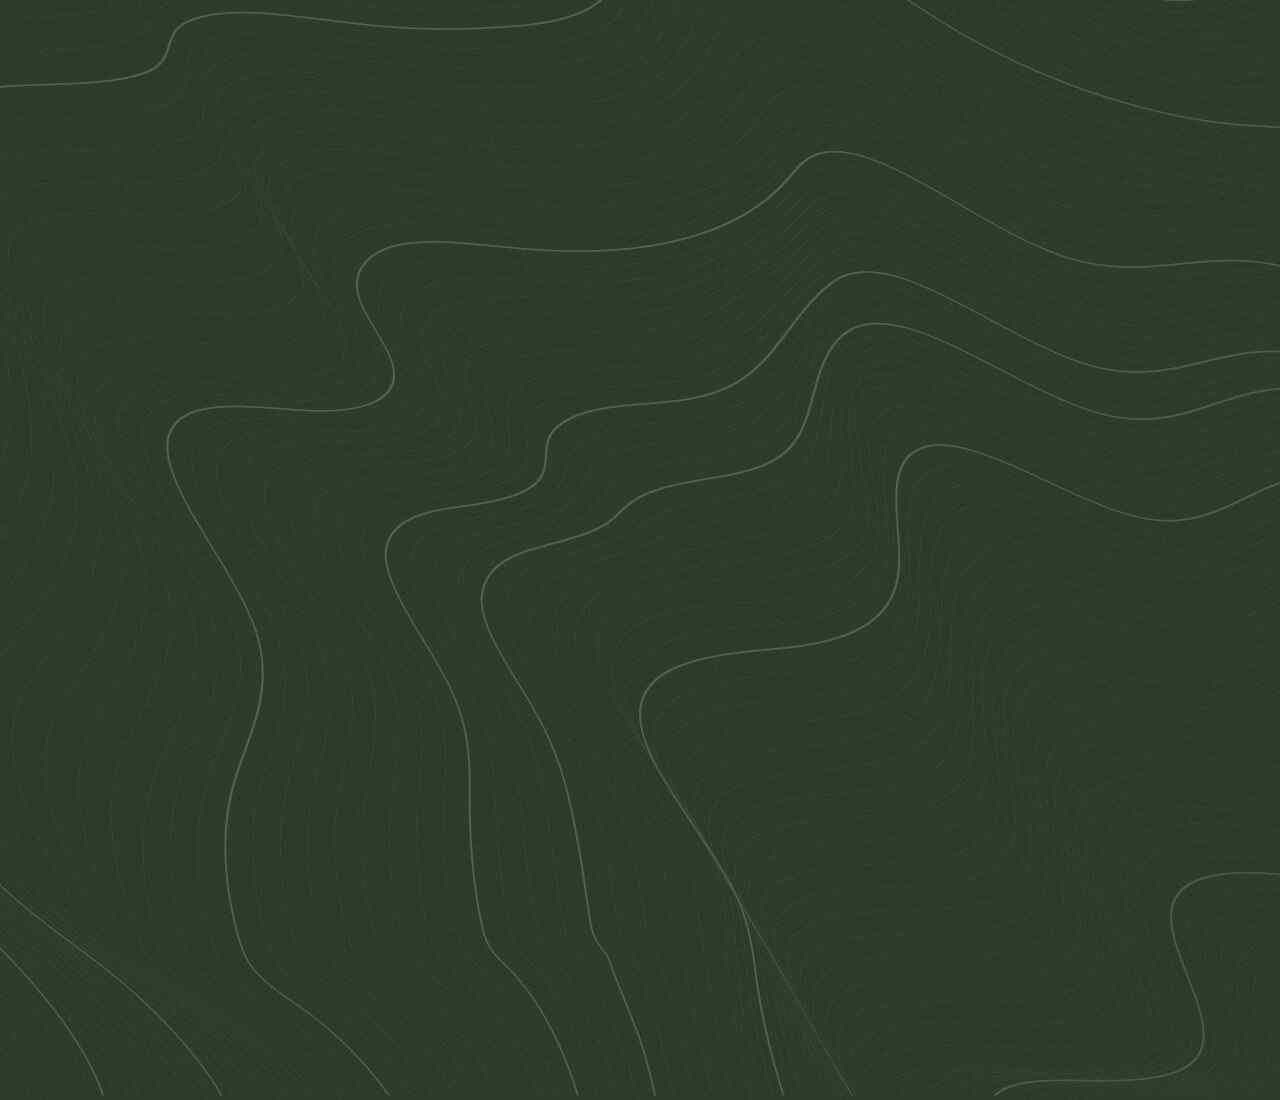 https://i2.wp.com/gbh.mx/wp-content/uploads/2020/02/green-background.jpg?resize=1280%2C1100&ssl=1